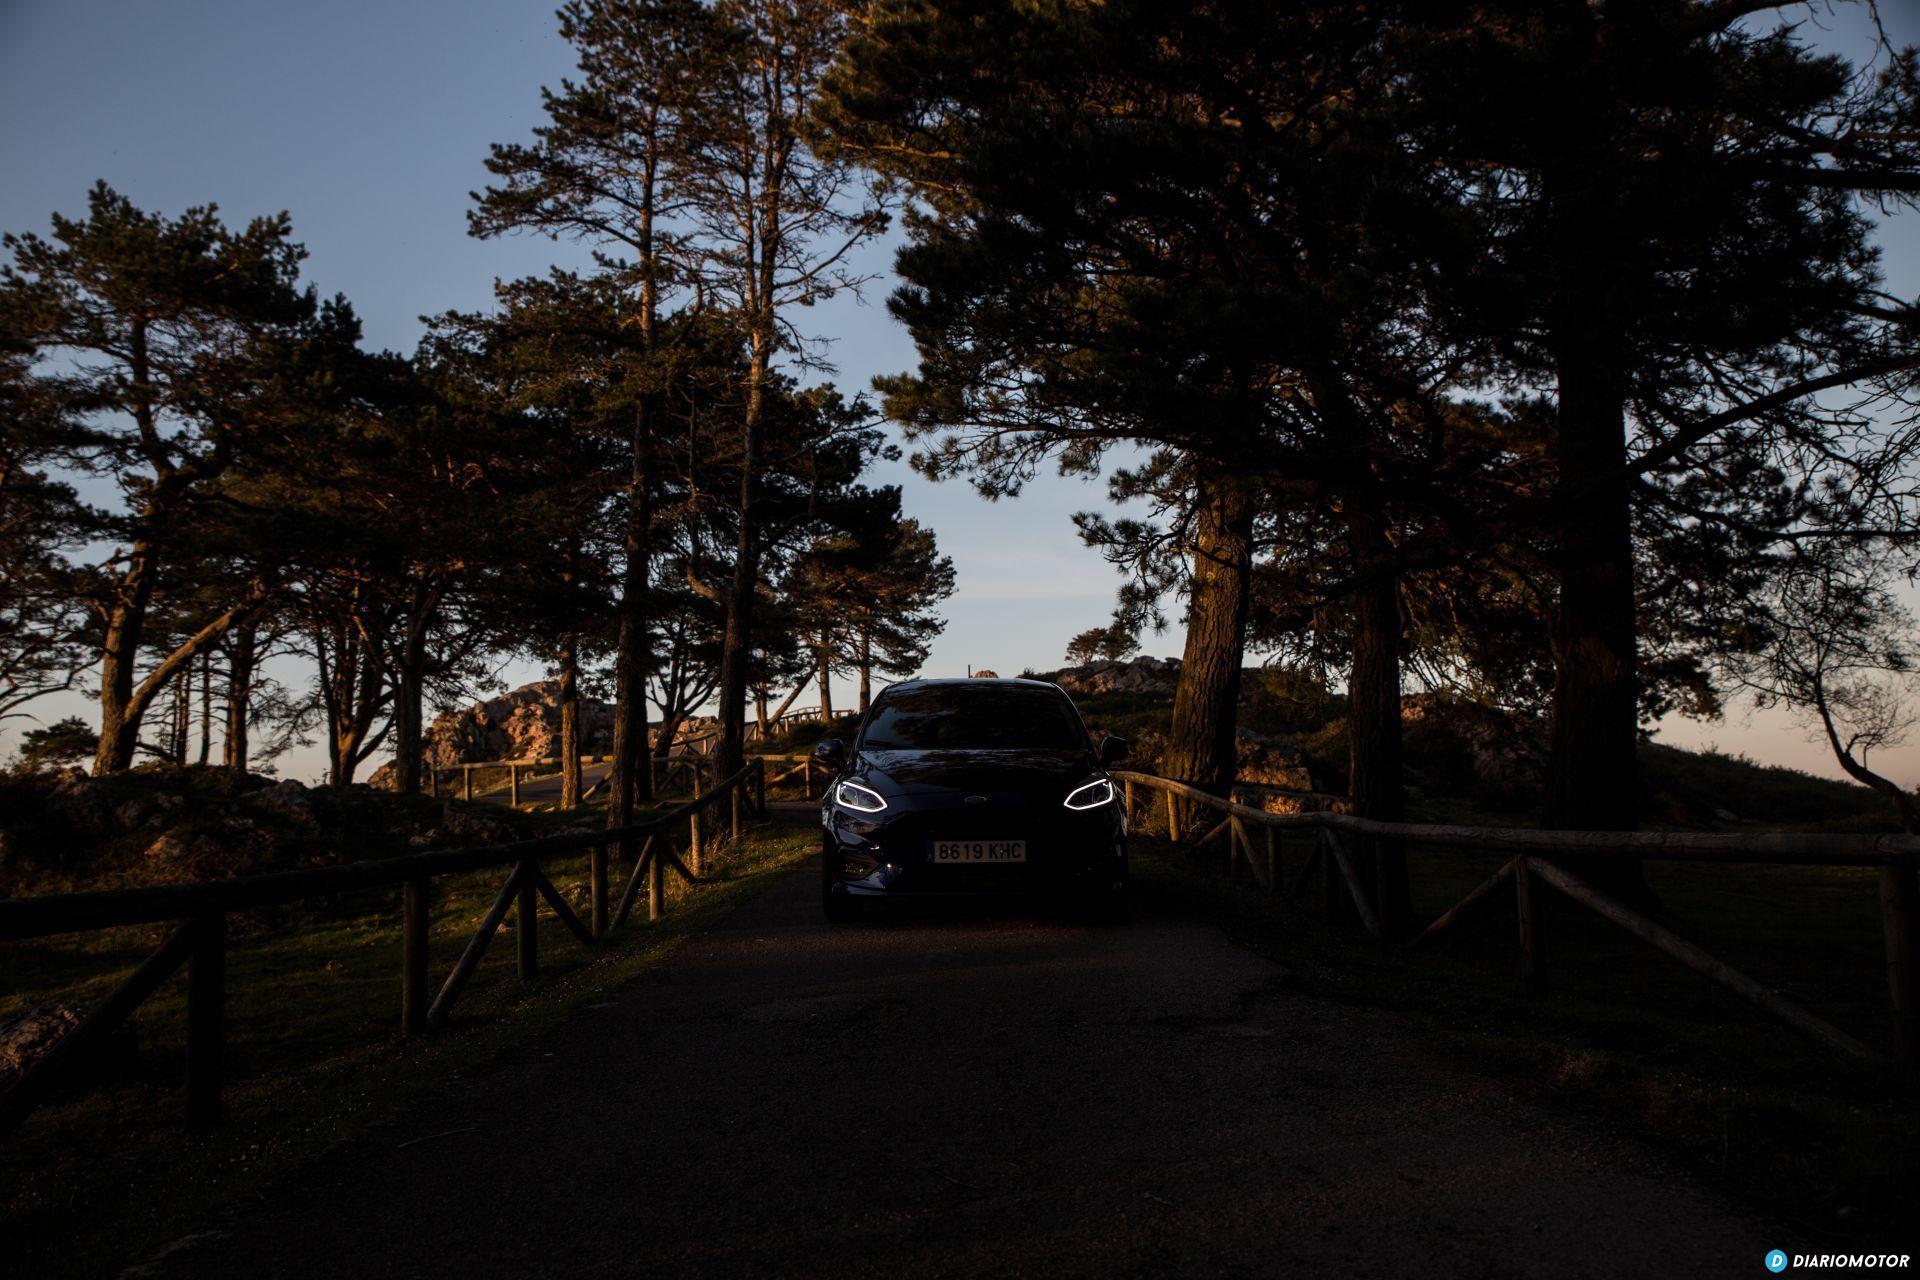 Ford Fiesta Prueba St Line 15